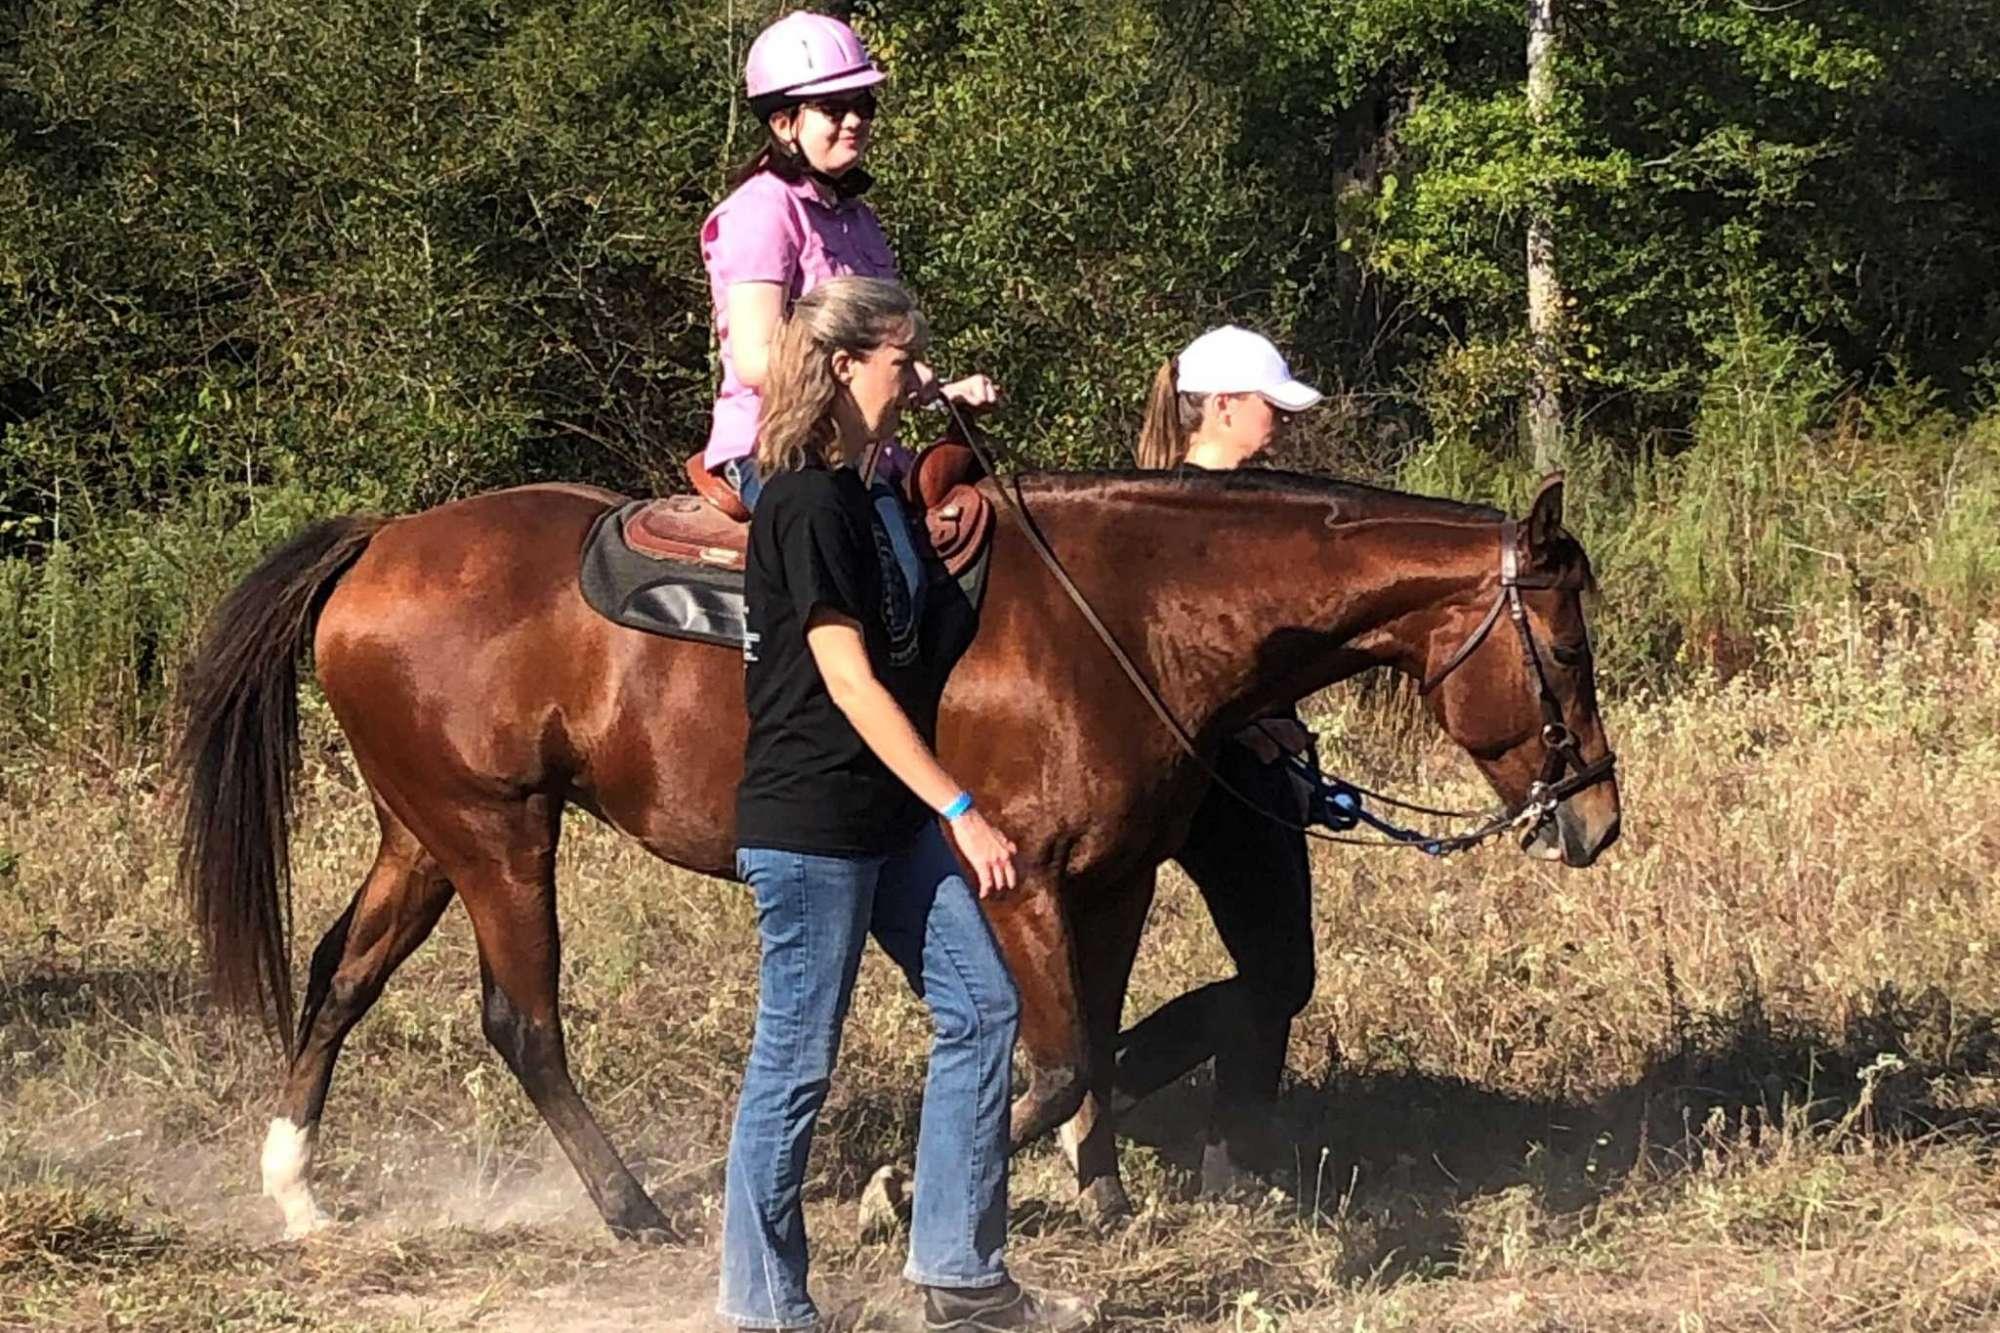 Ladana Igler rides at SIRE Therapeutic Horsemanship